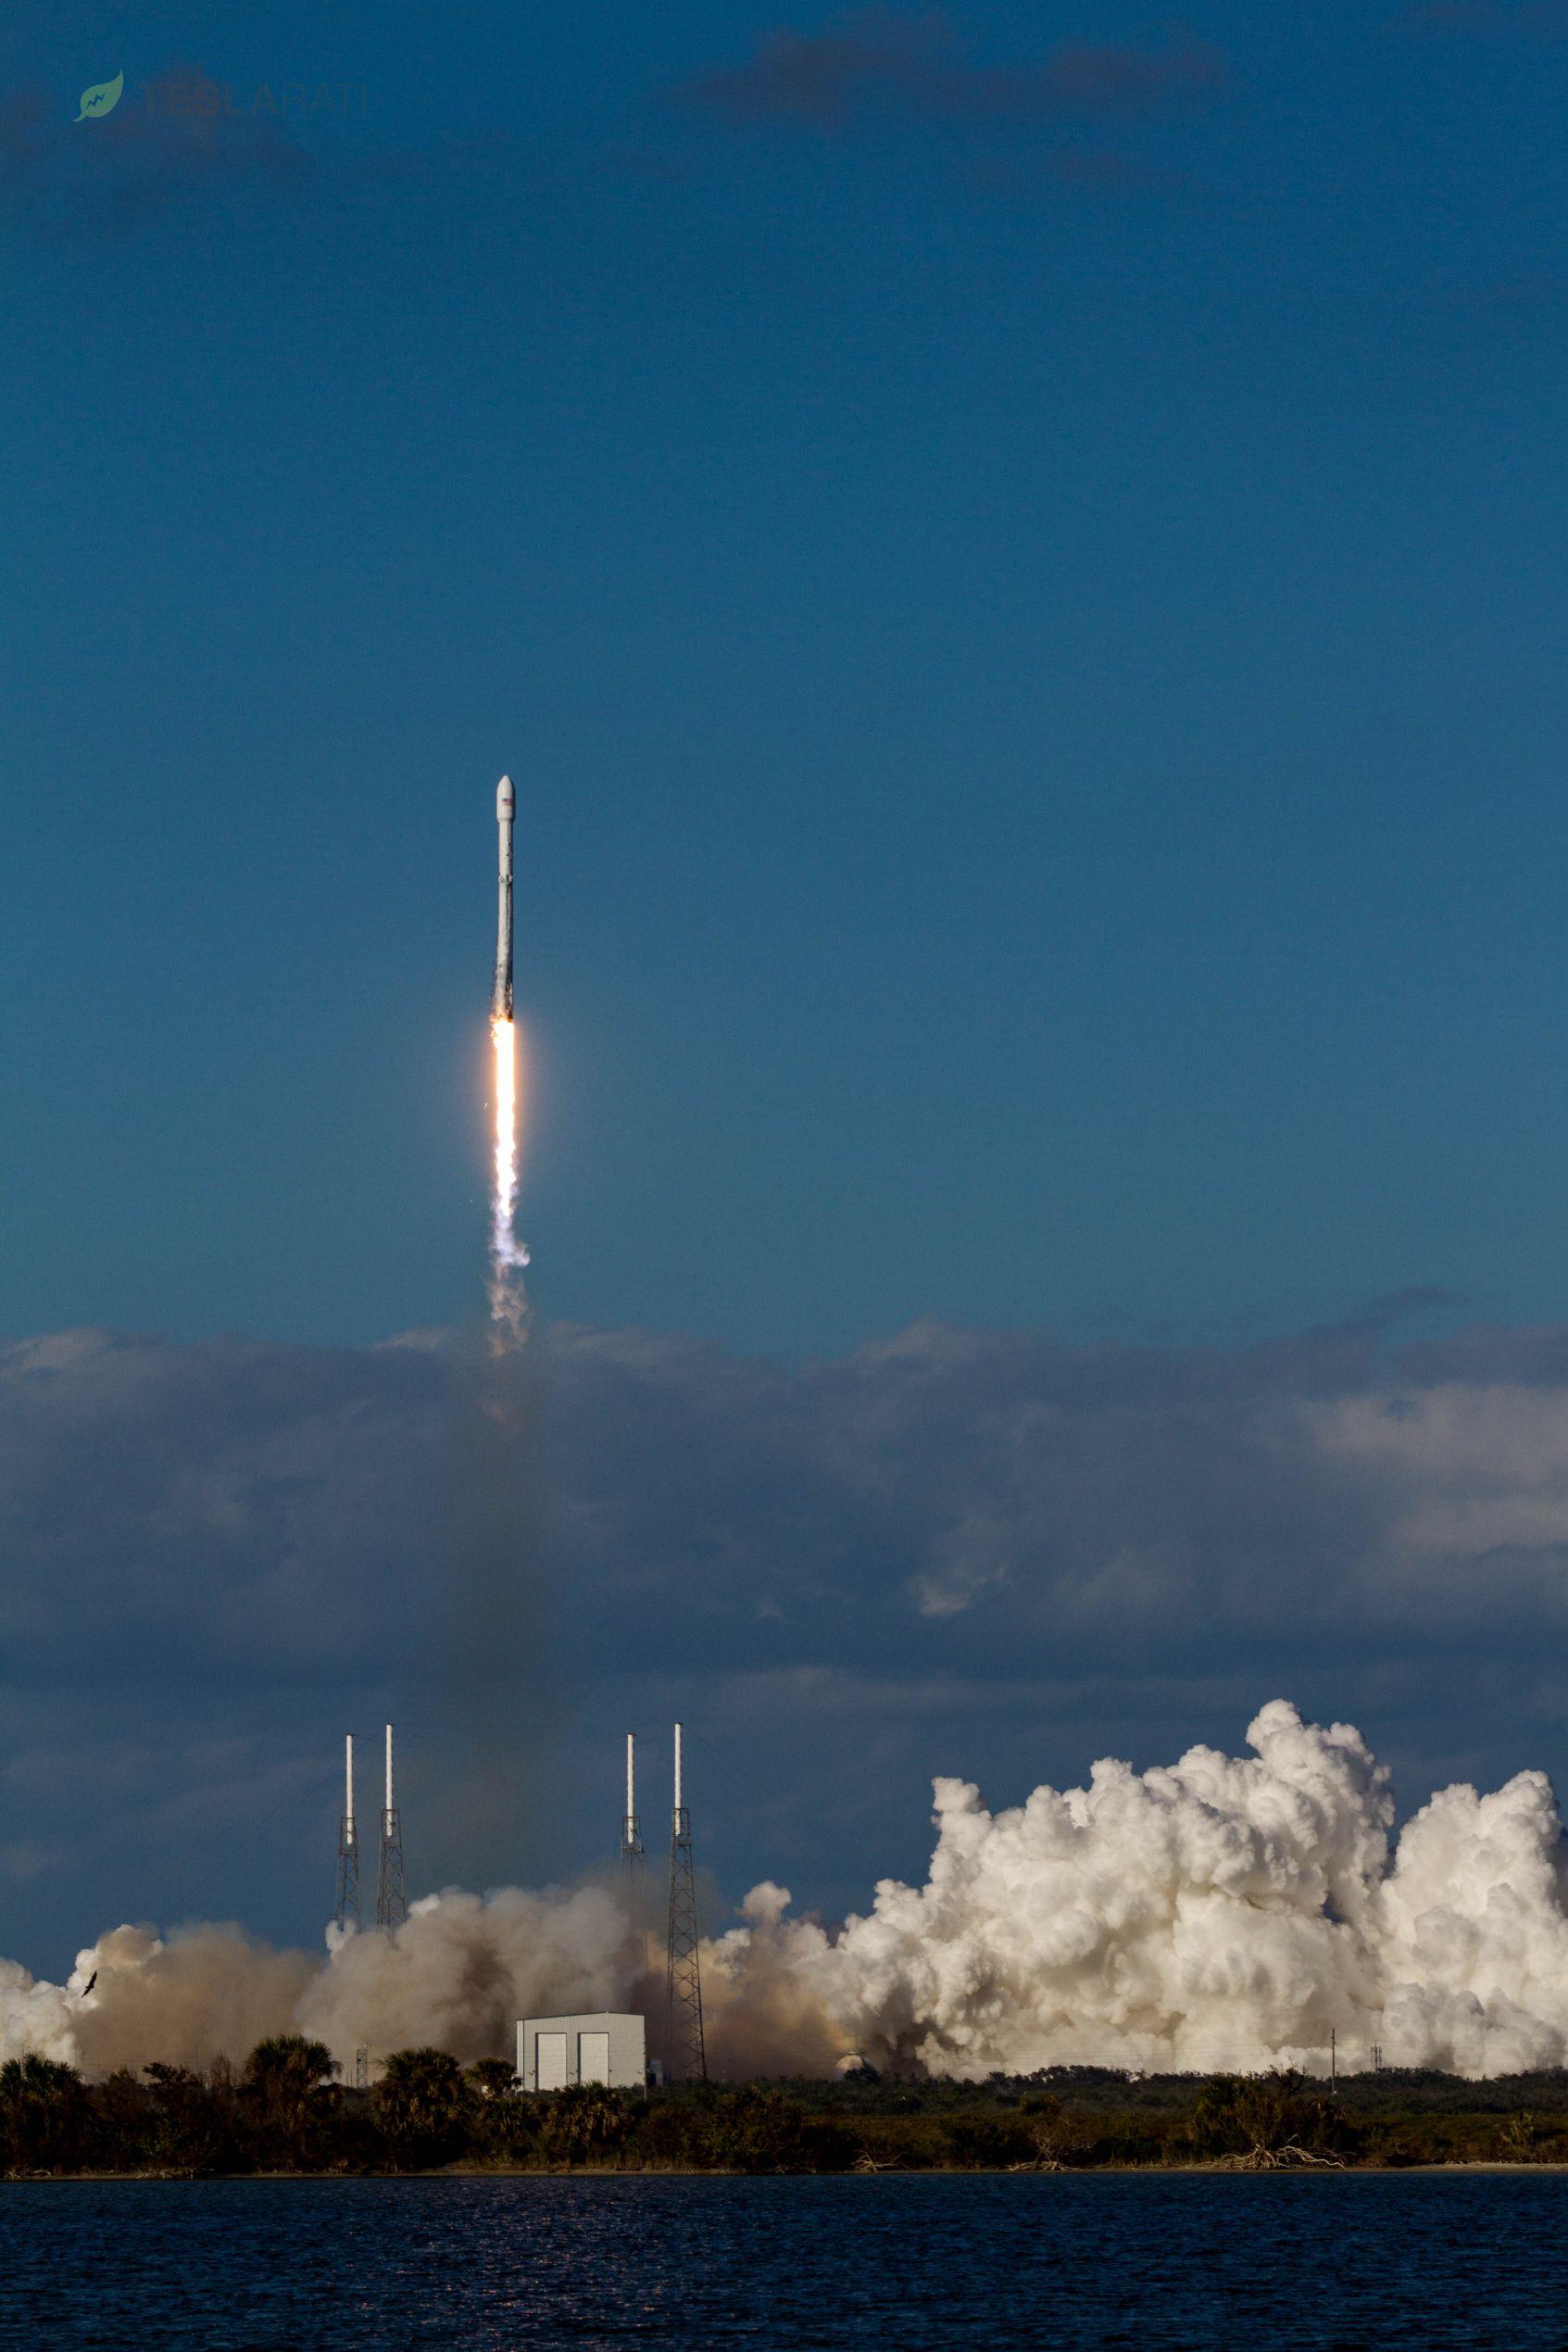 GovSat launch 2 (Tom Cross)